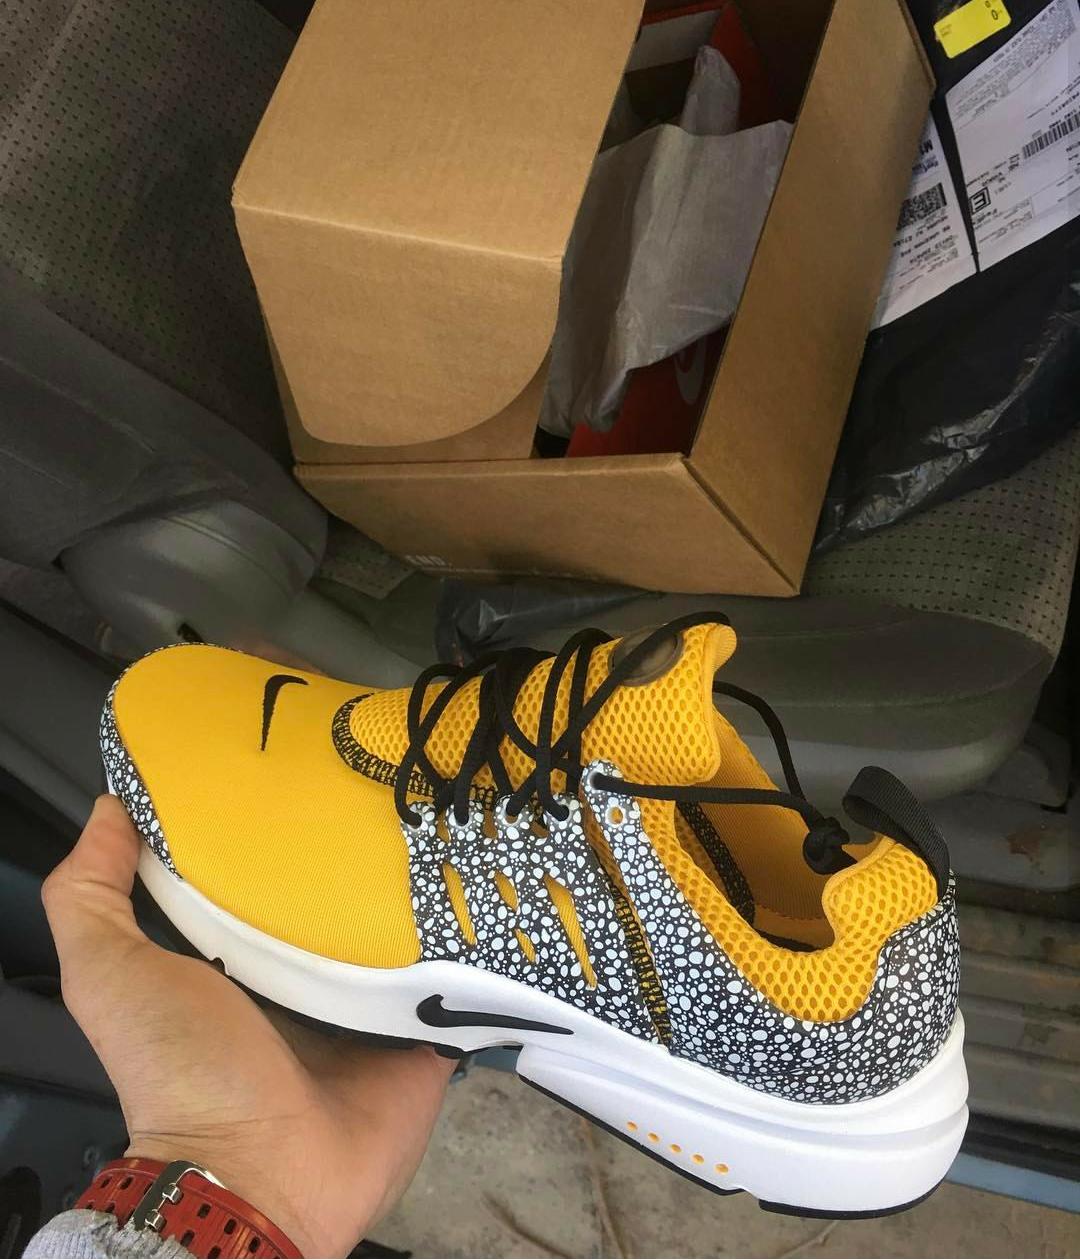 Presto YellowBee in 2019